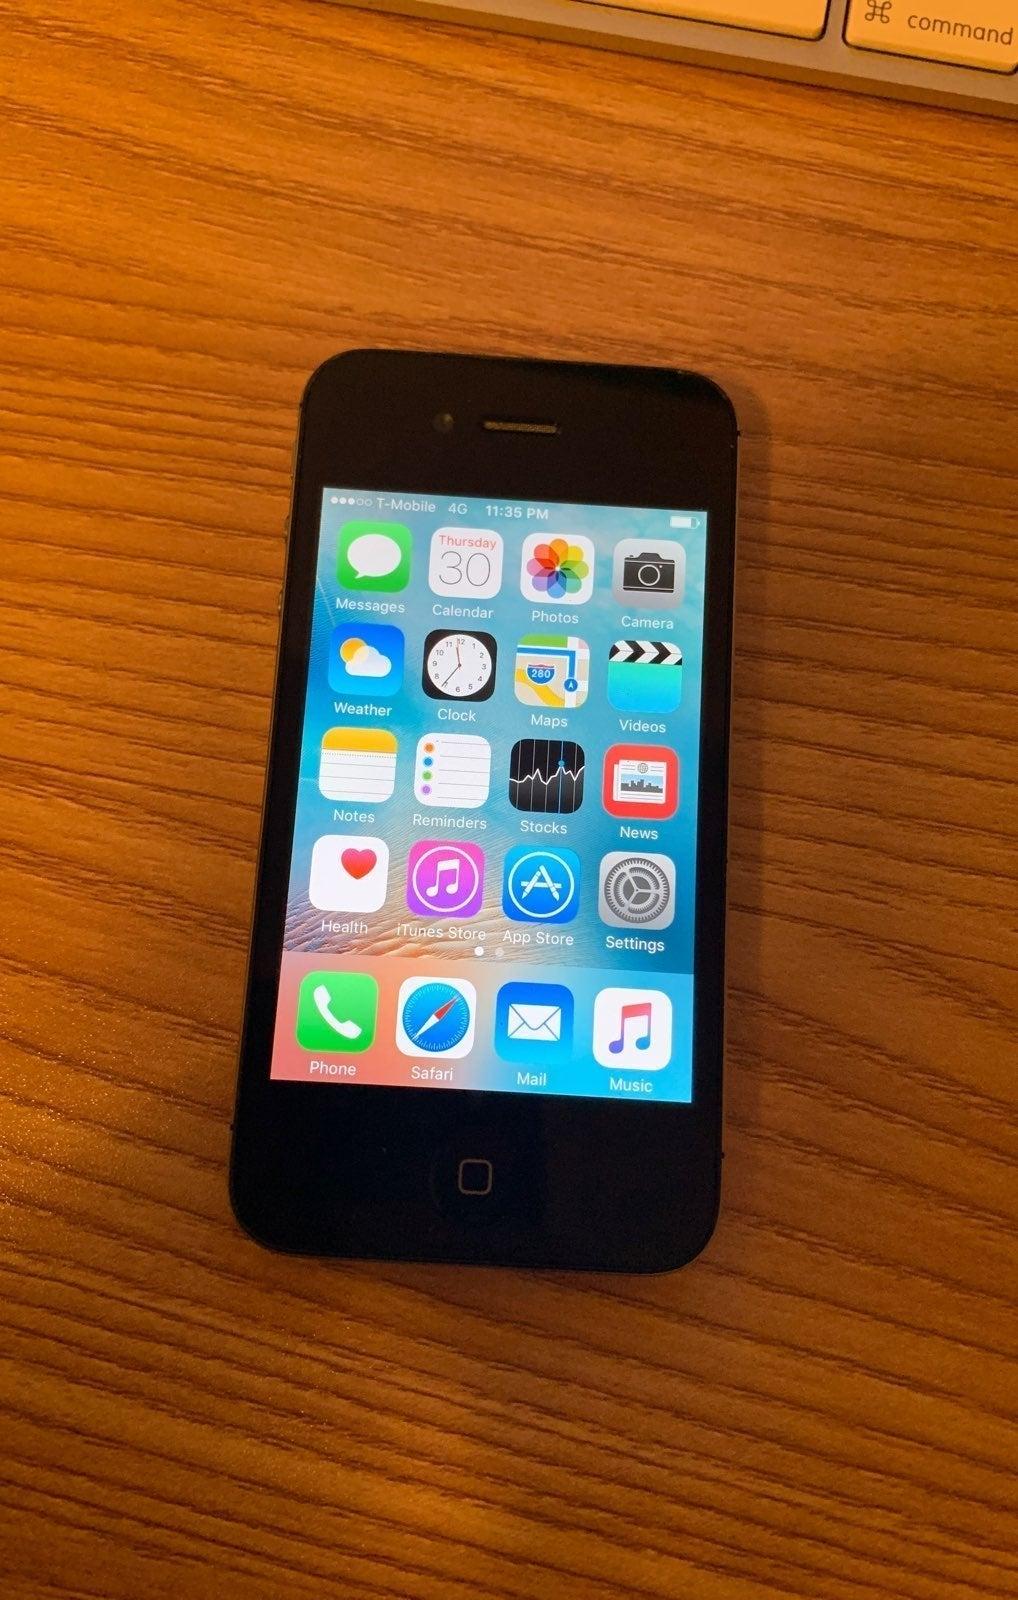 iPhone 4s Black 16 GB Unlocked